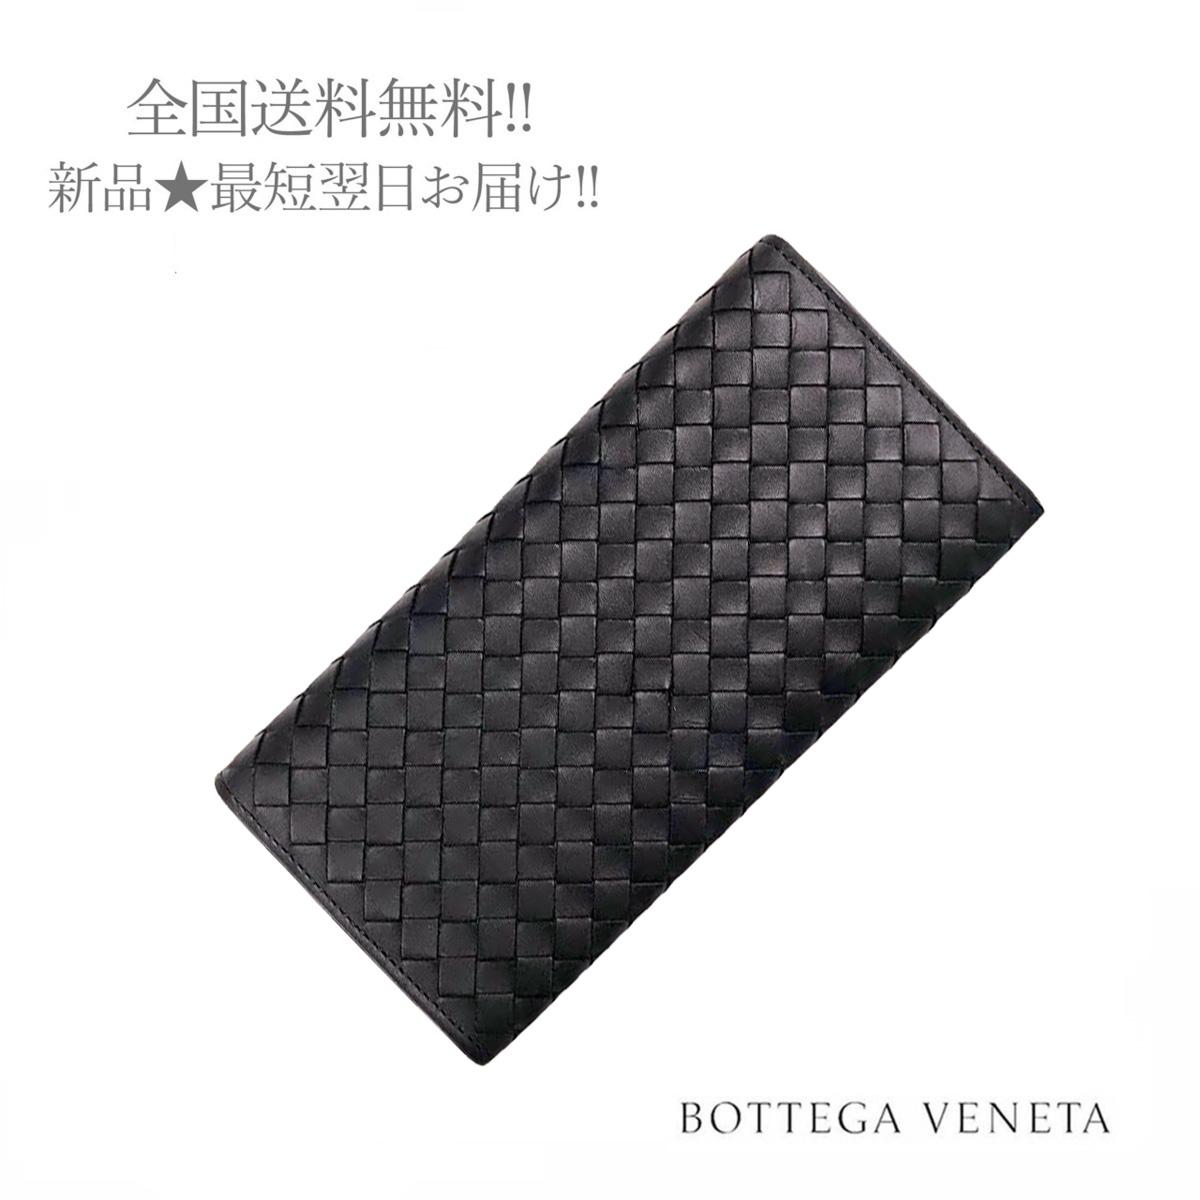 BOTTEGA VENETA ボッテガ ヴェネタ 店舗 長財布 2つ折り ライトトルマリン 4013 新品 メンズ イタリア製 男 往復送料無料